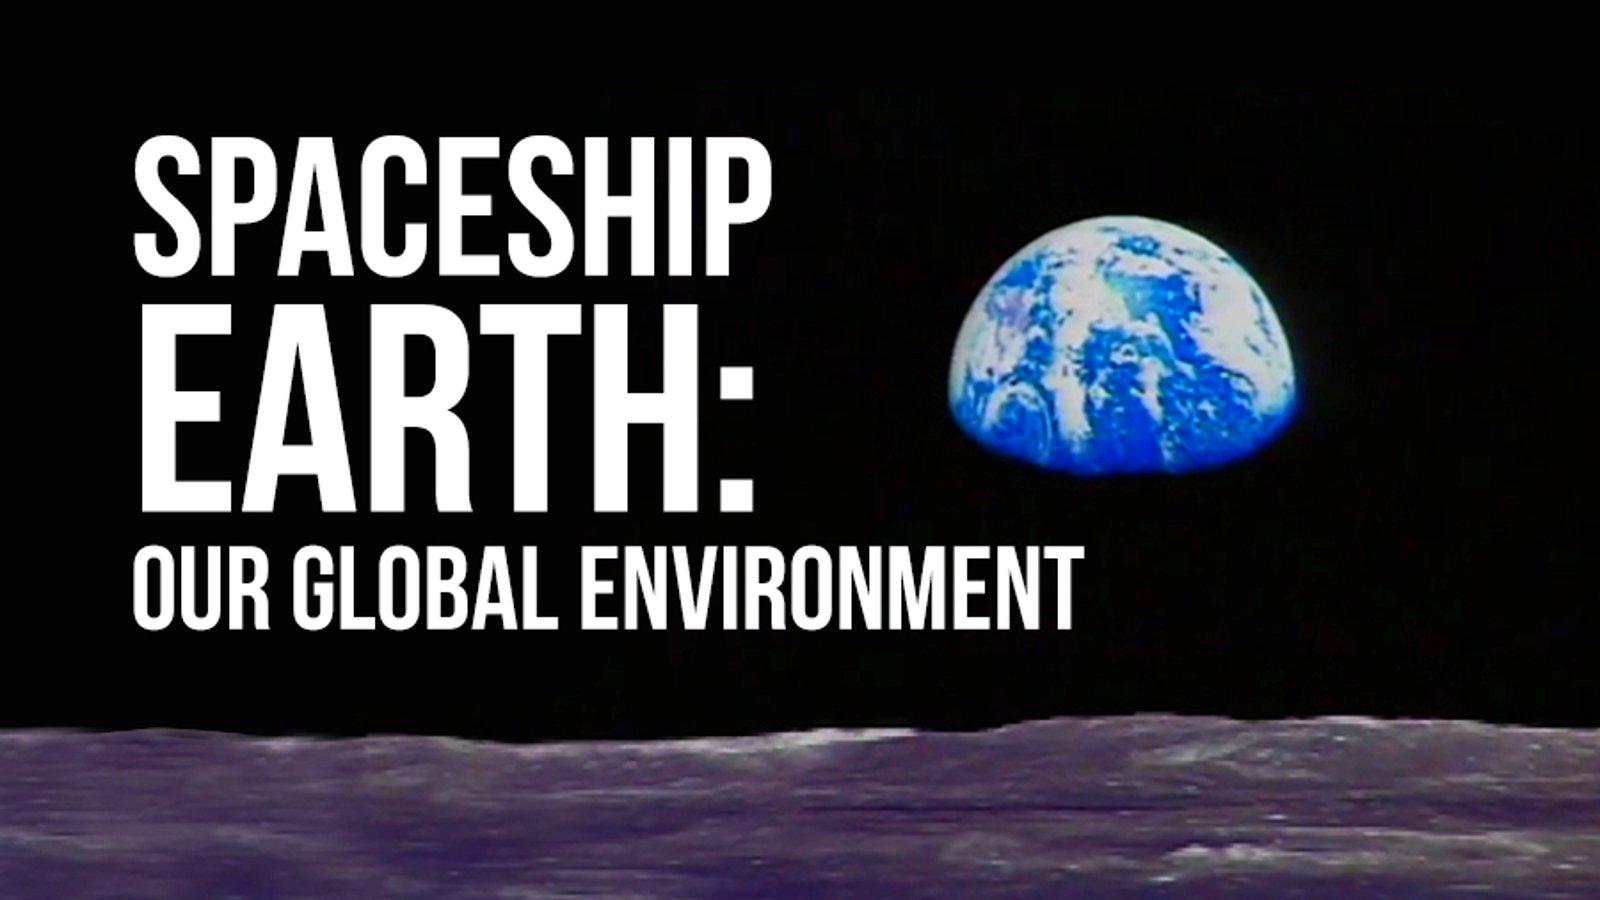 Spaceship Earth - Our Global Environment